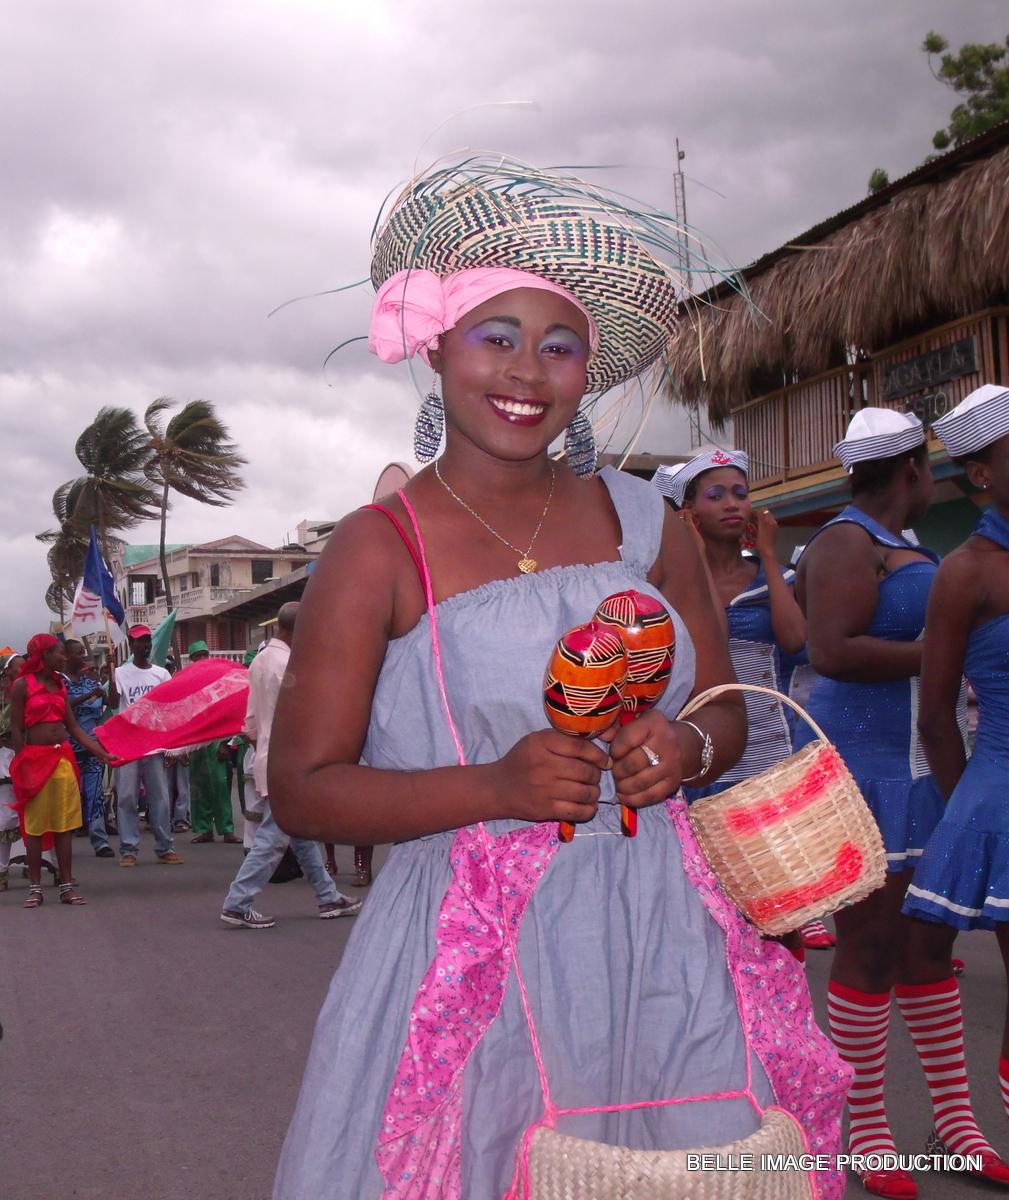 Festival de la mer au Cap-Haitien  :13 au 15 juille saki rete anko  nan vil Okap 18-18-GEDC0034